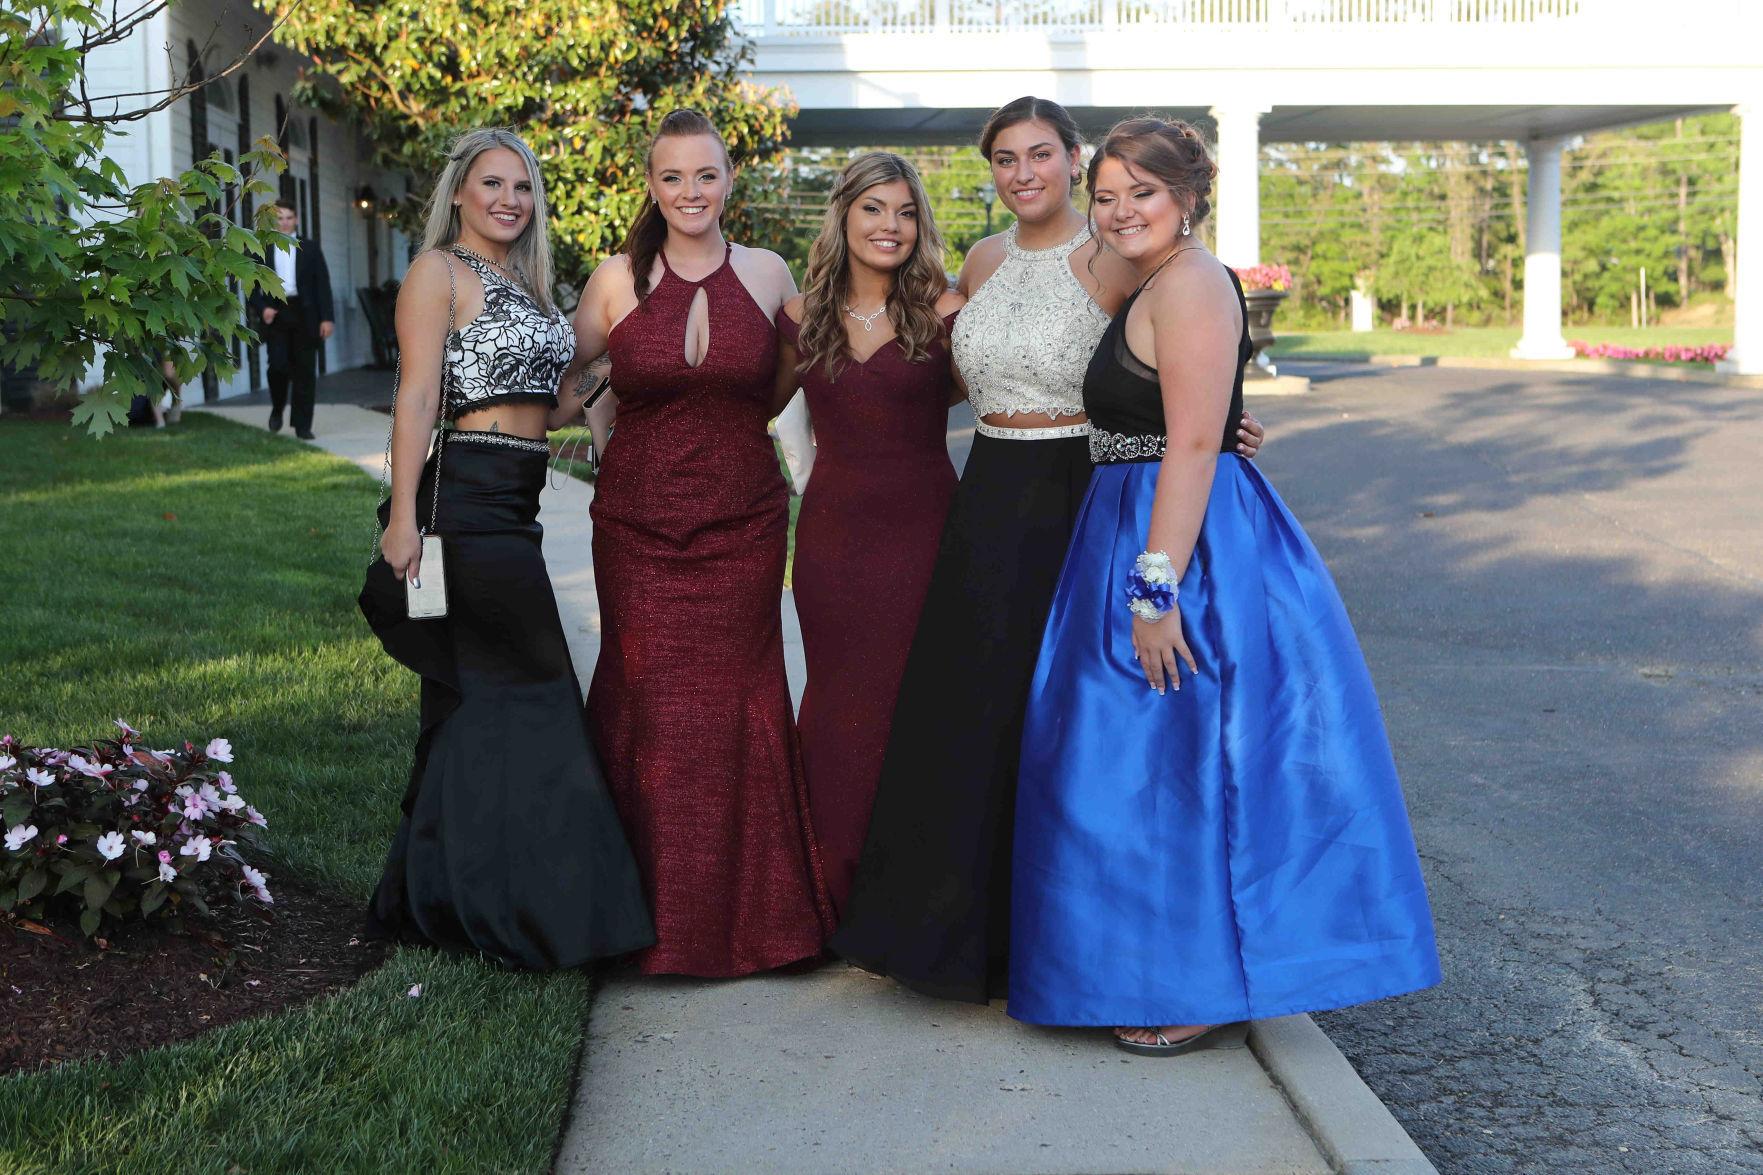 Tuckerton Prom Dresses